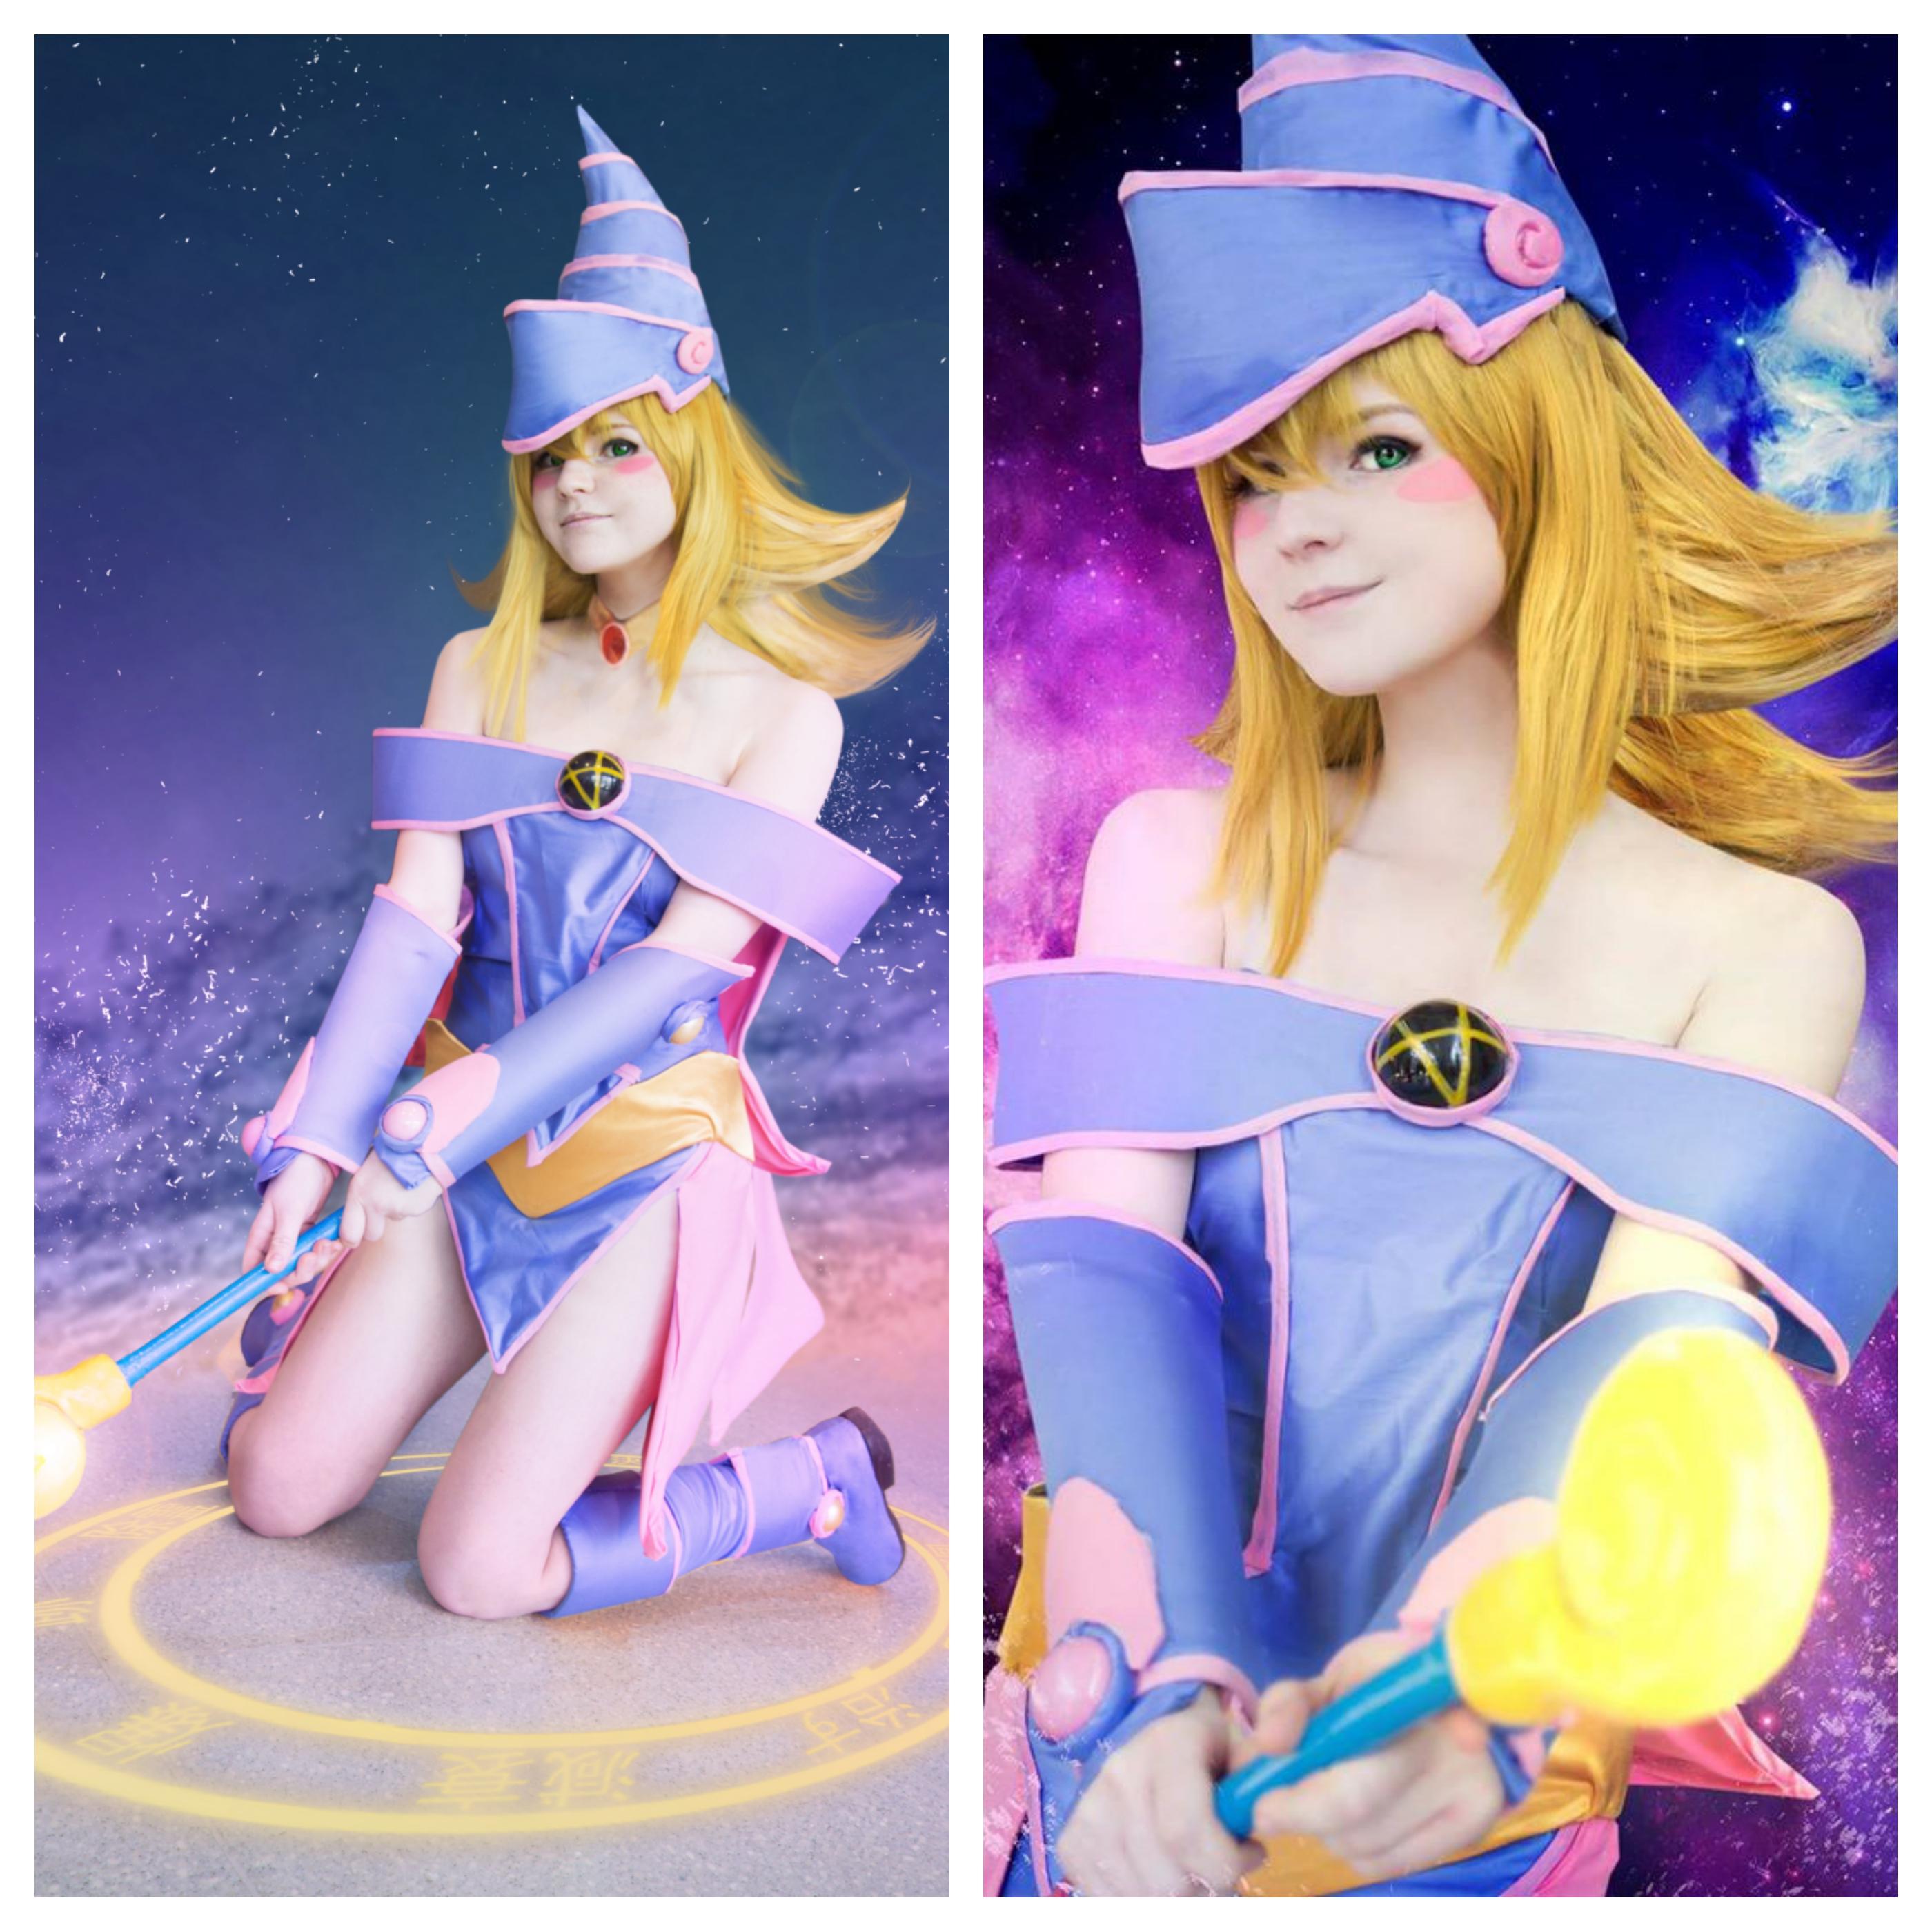 Dark Magician Girl Print Set  sc 1 st  Online Store Powered by Storenvy & Dark Magician Girl Print Set · FoxyLiddels little Wonderland ...